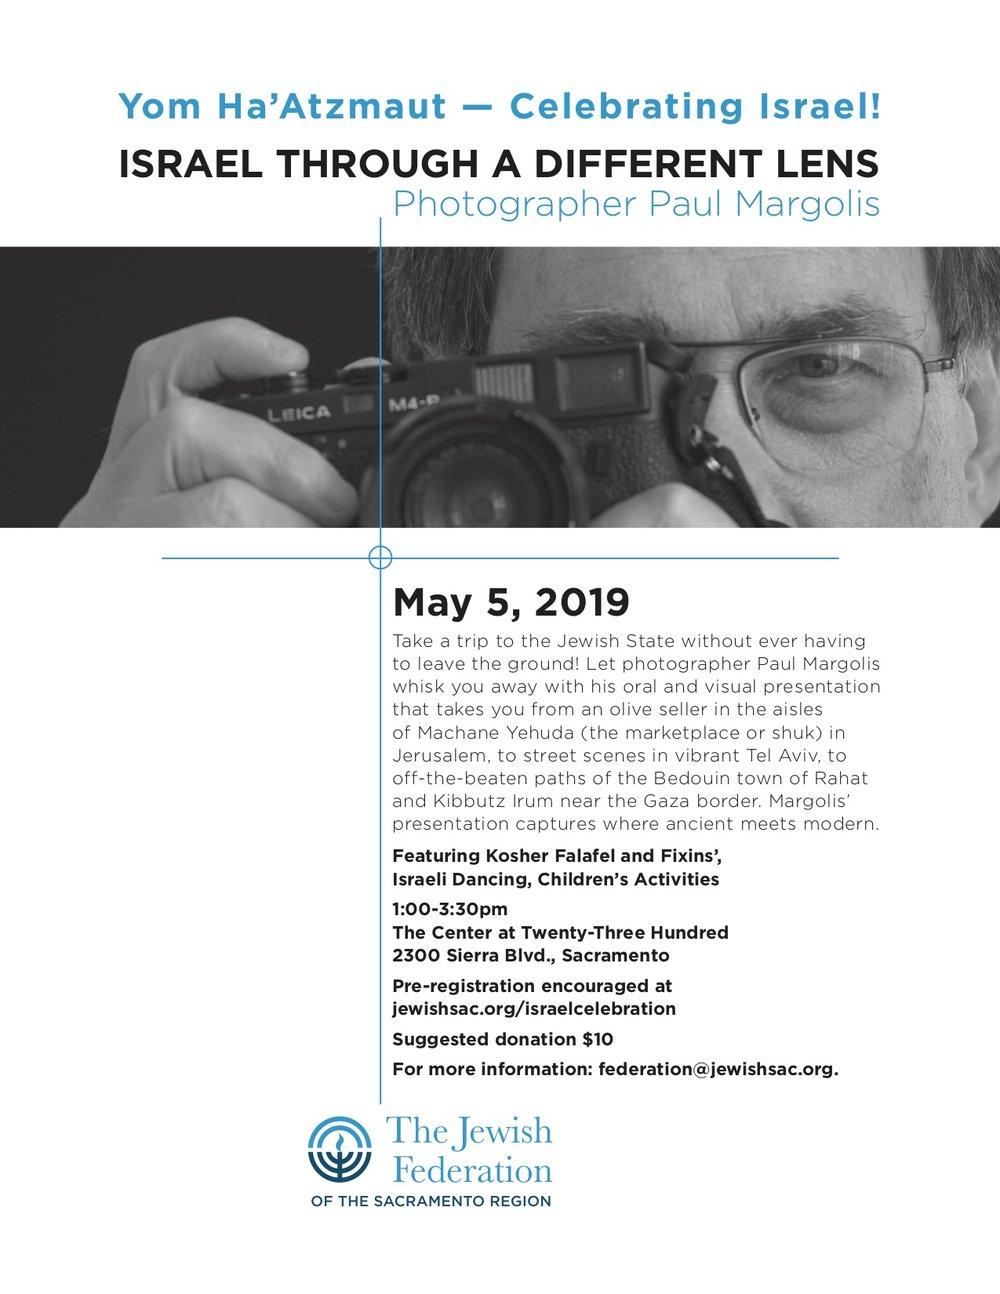 Israel Celebration May 5, 2019.jpg